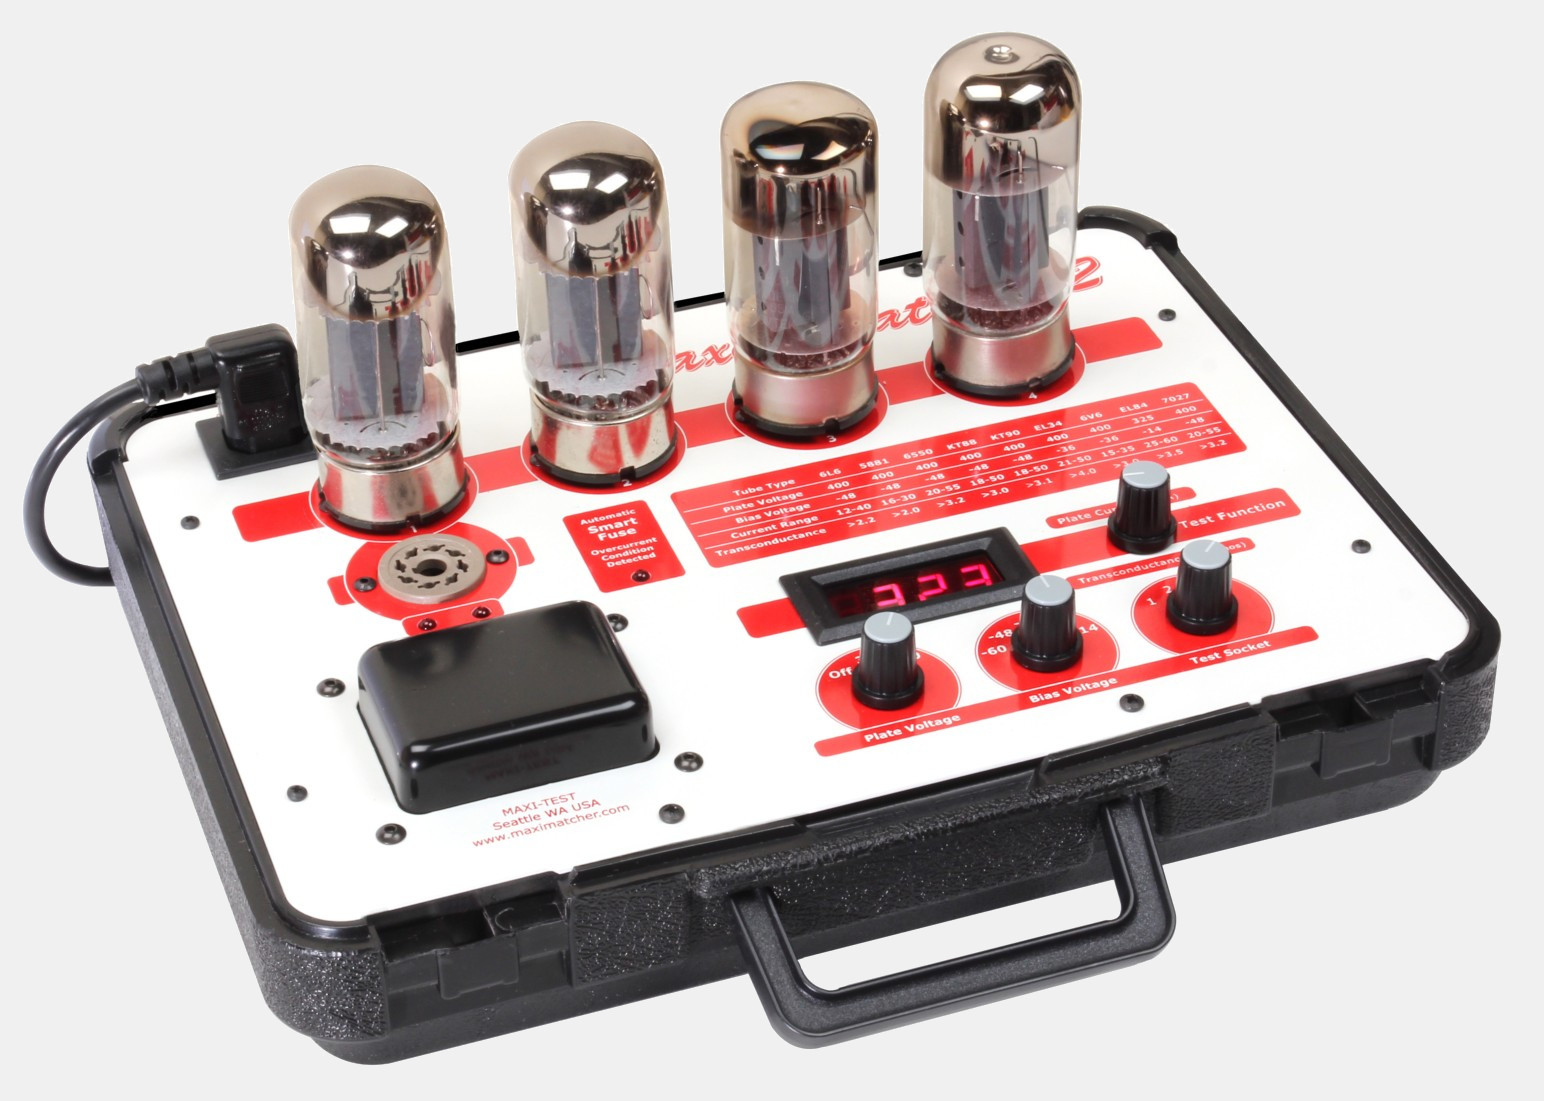 Digital Tube Tester : Maxi test digital tube tester vacuum testing